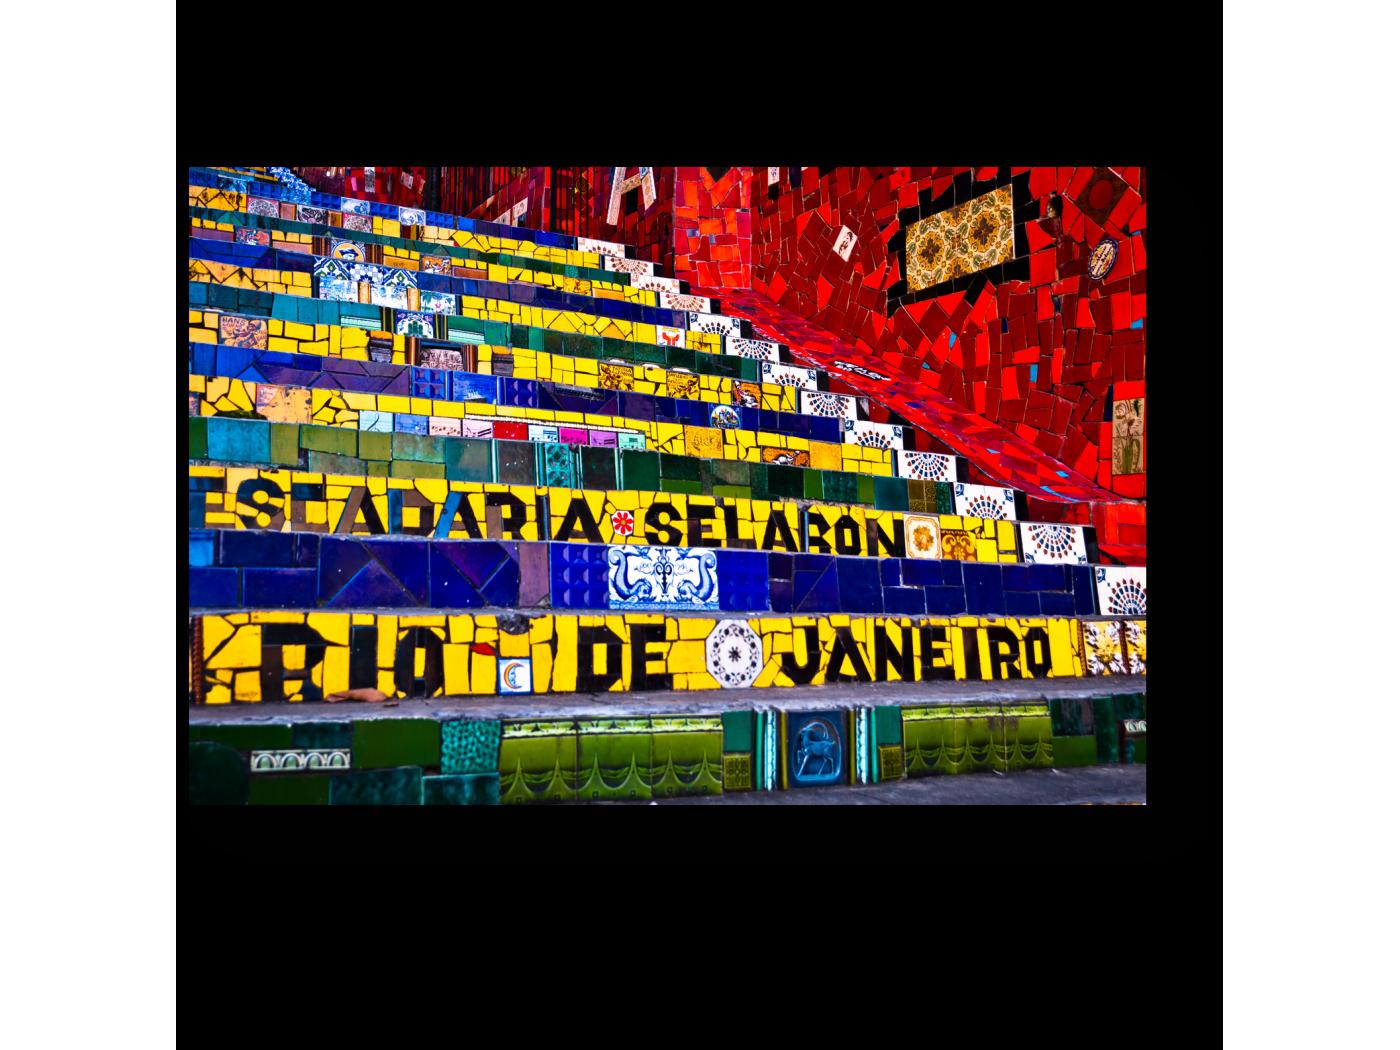 Модульная картина Яркие краски Рио (30x20) фото